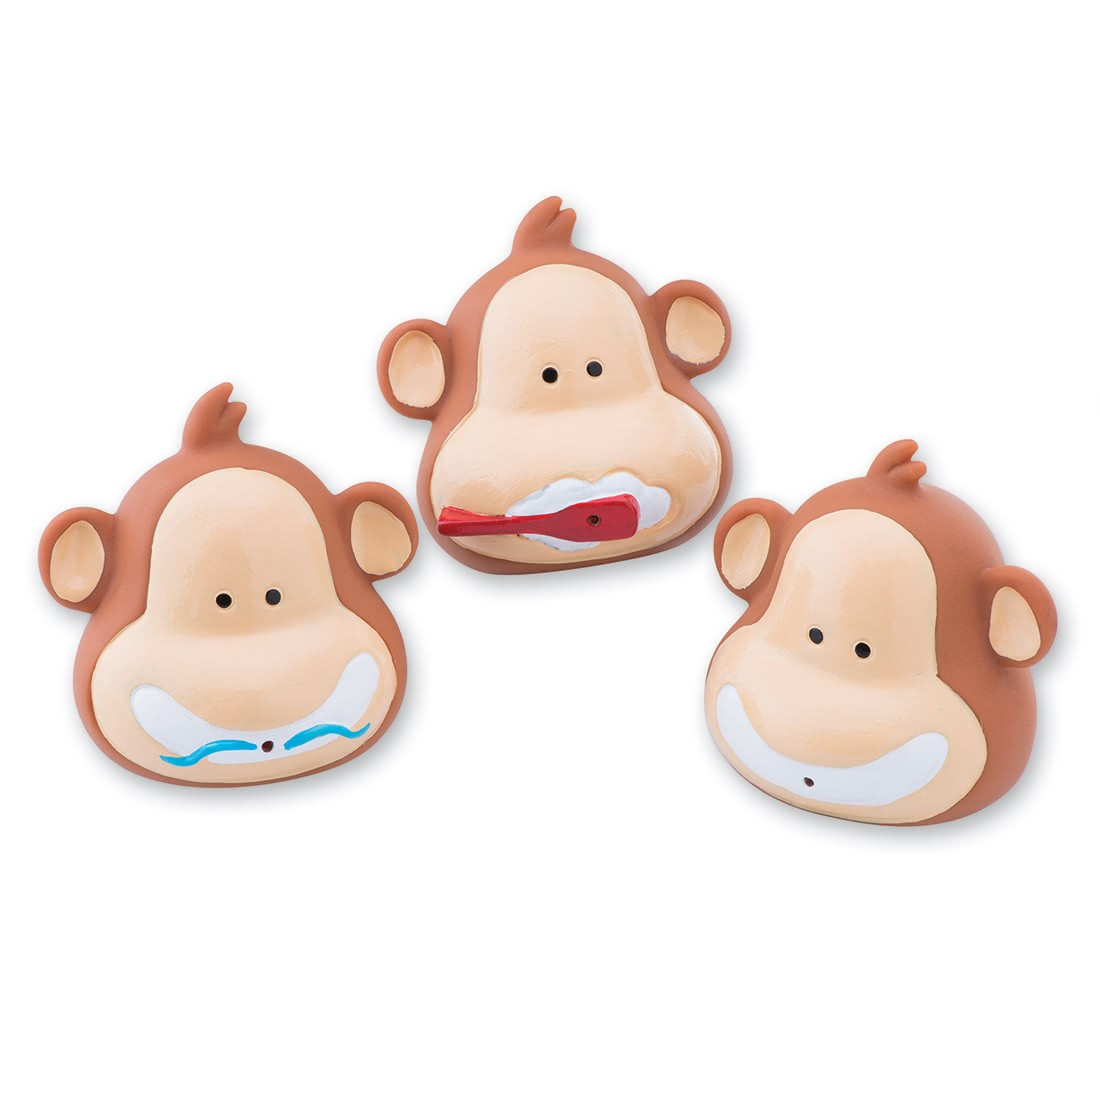 Brush Floss Smile Monkey Squirters [image]